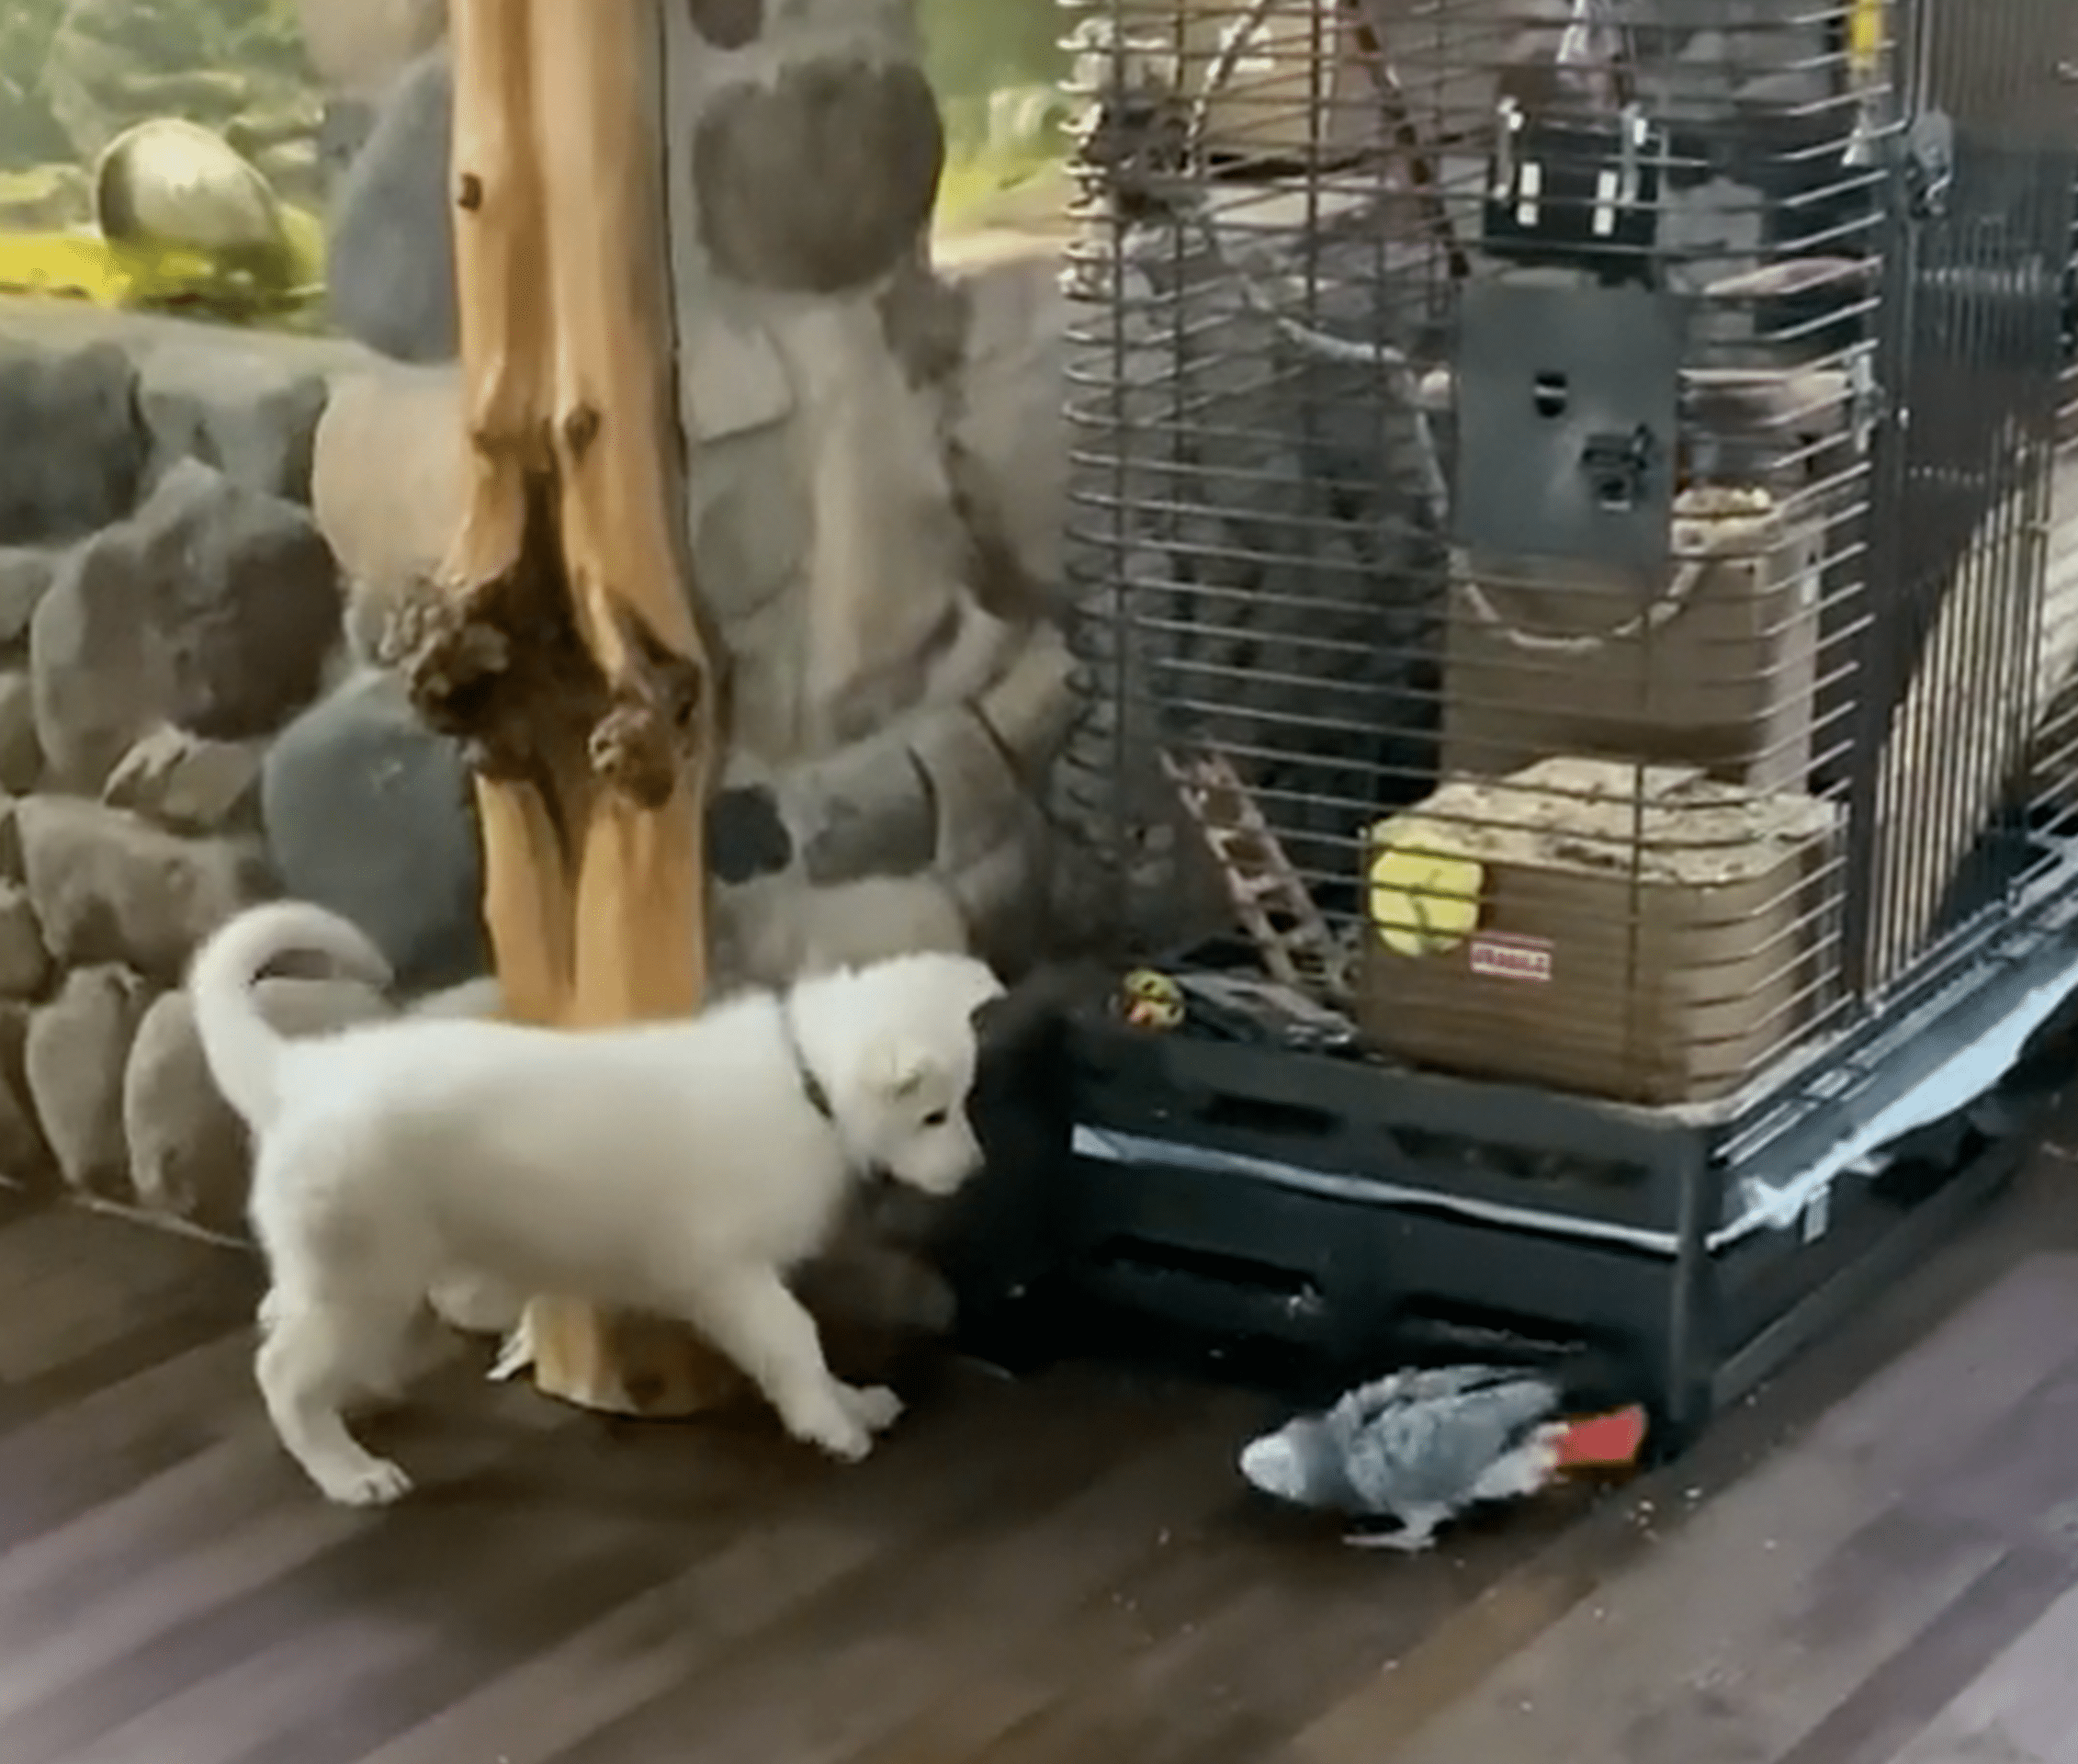 Stanley Genadek spending time with his pets between work.